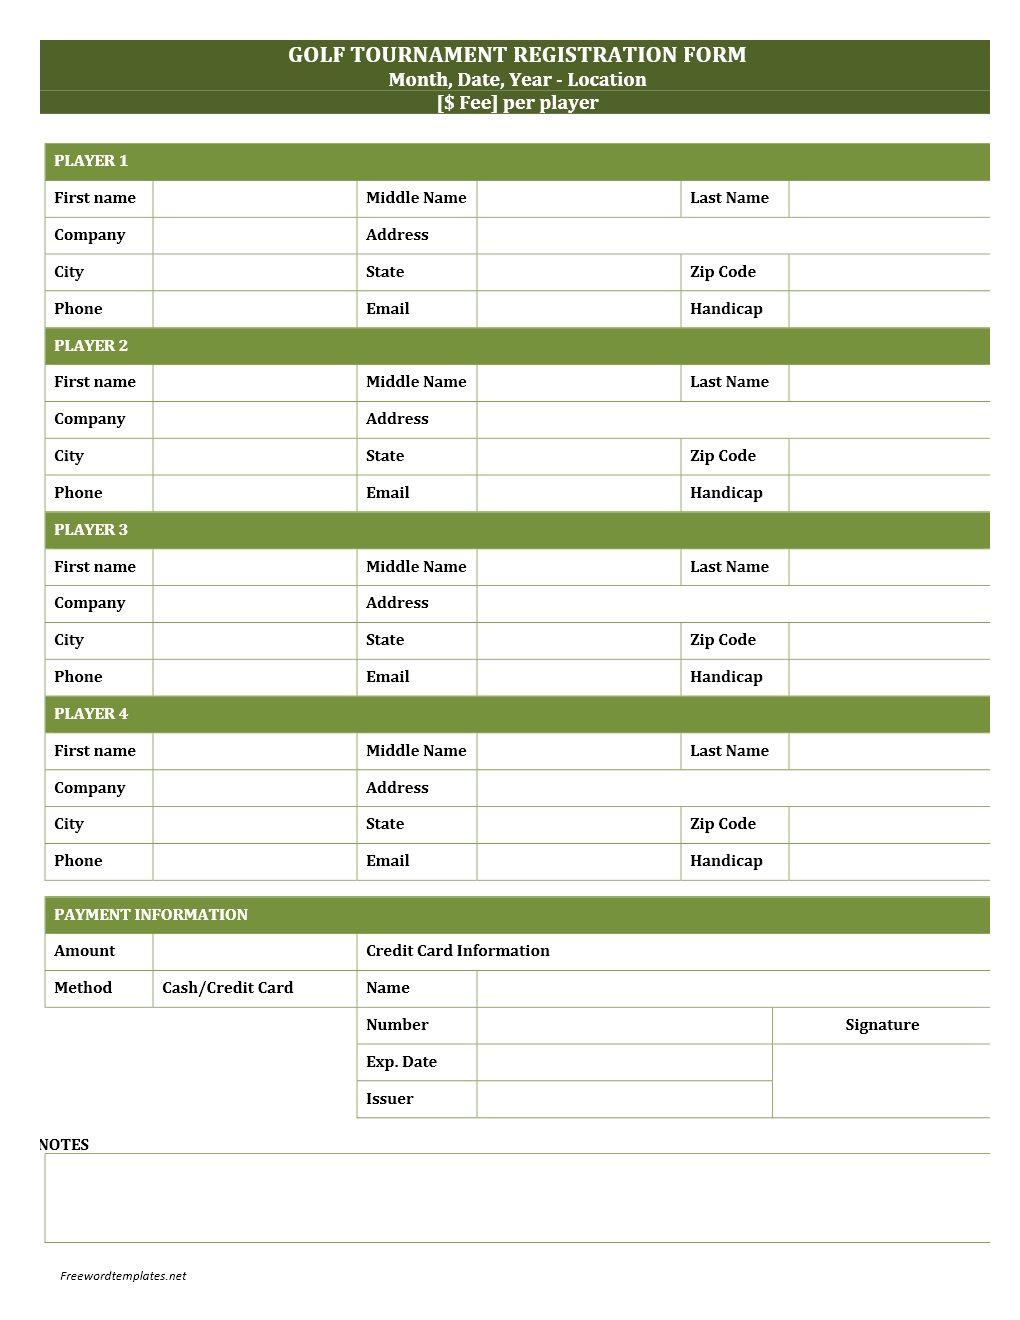 golf tournament registration form template jpg 1020 1320 golf